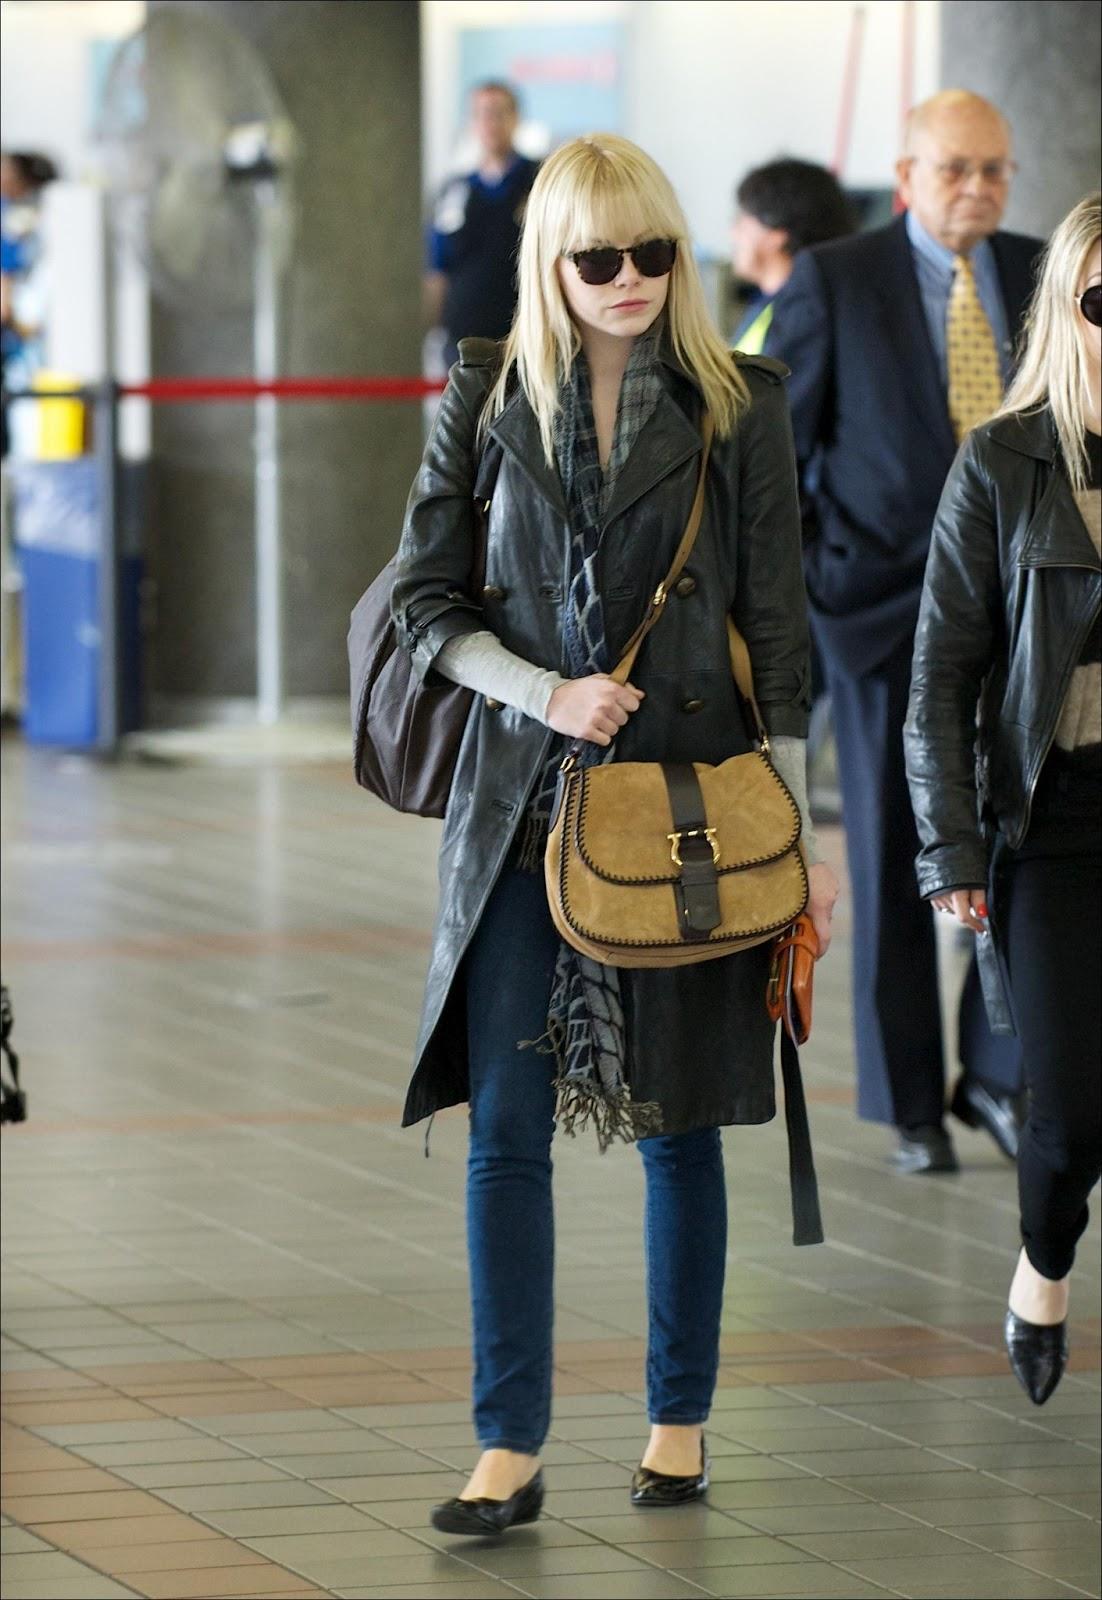 Emma Stone: Emma Stone Street Style